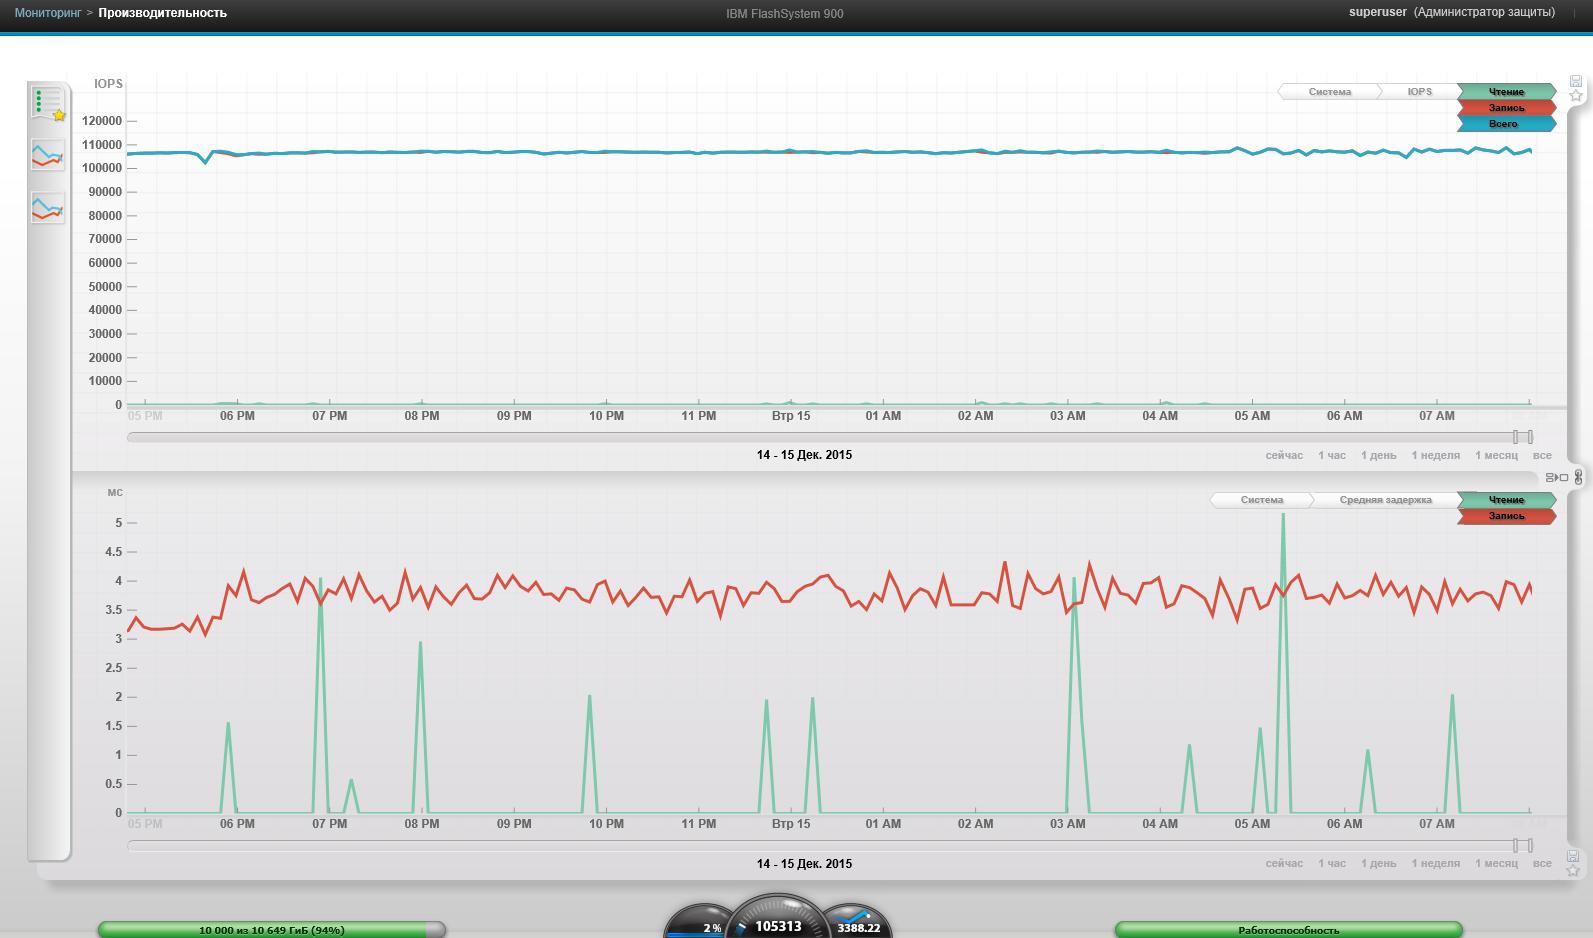 Обзор и тестирование флеш-хранилища от IBM FlashSystem 900 - 20